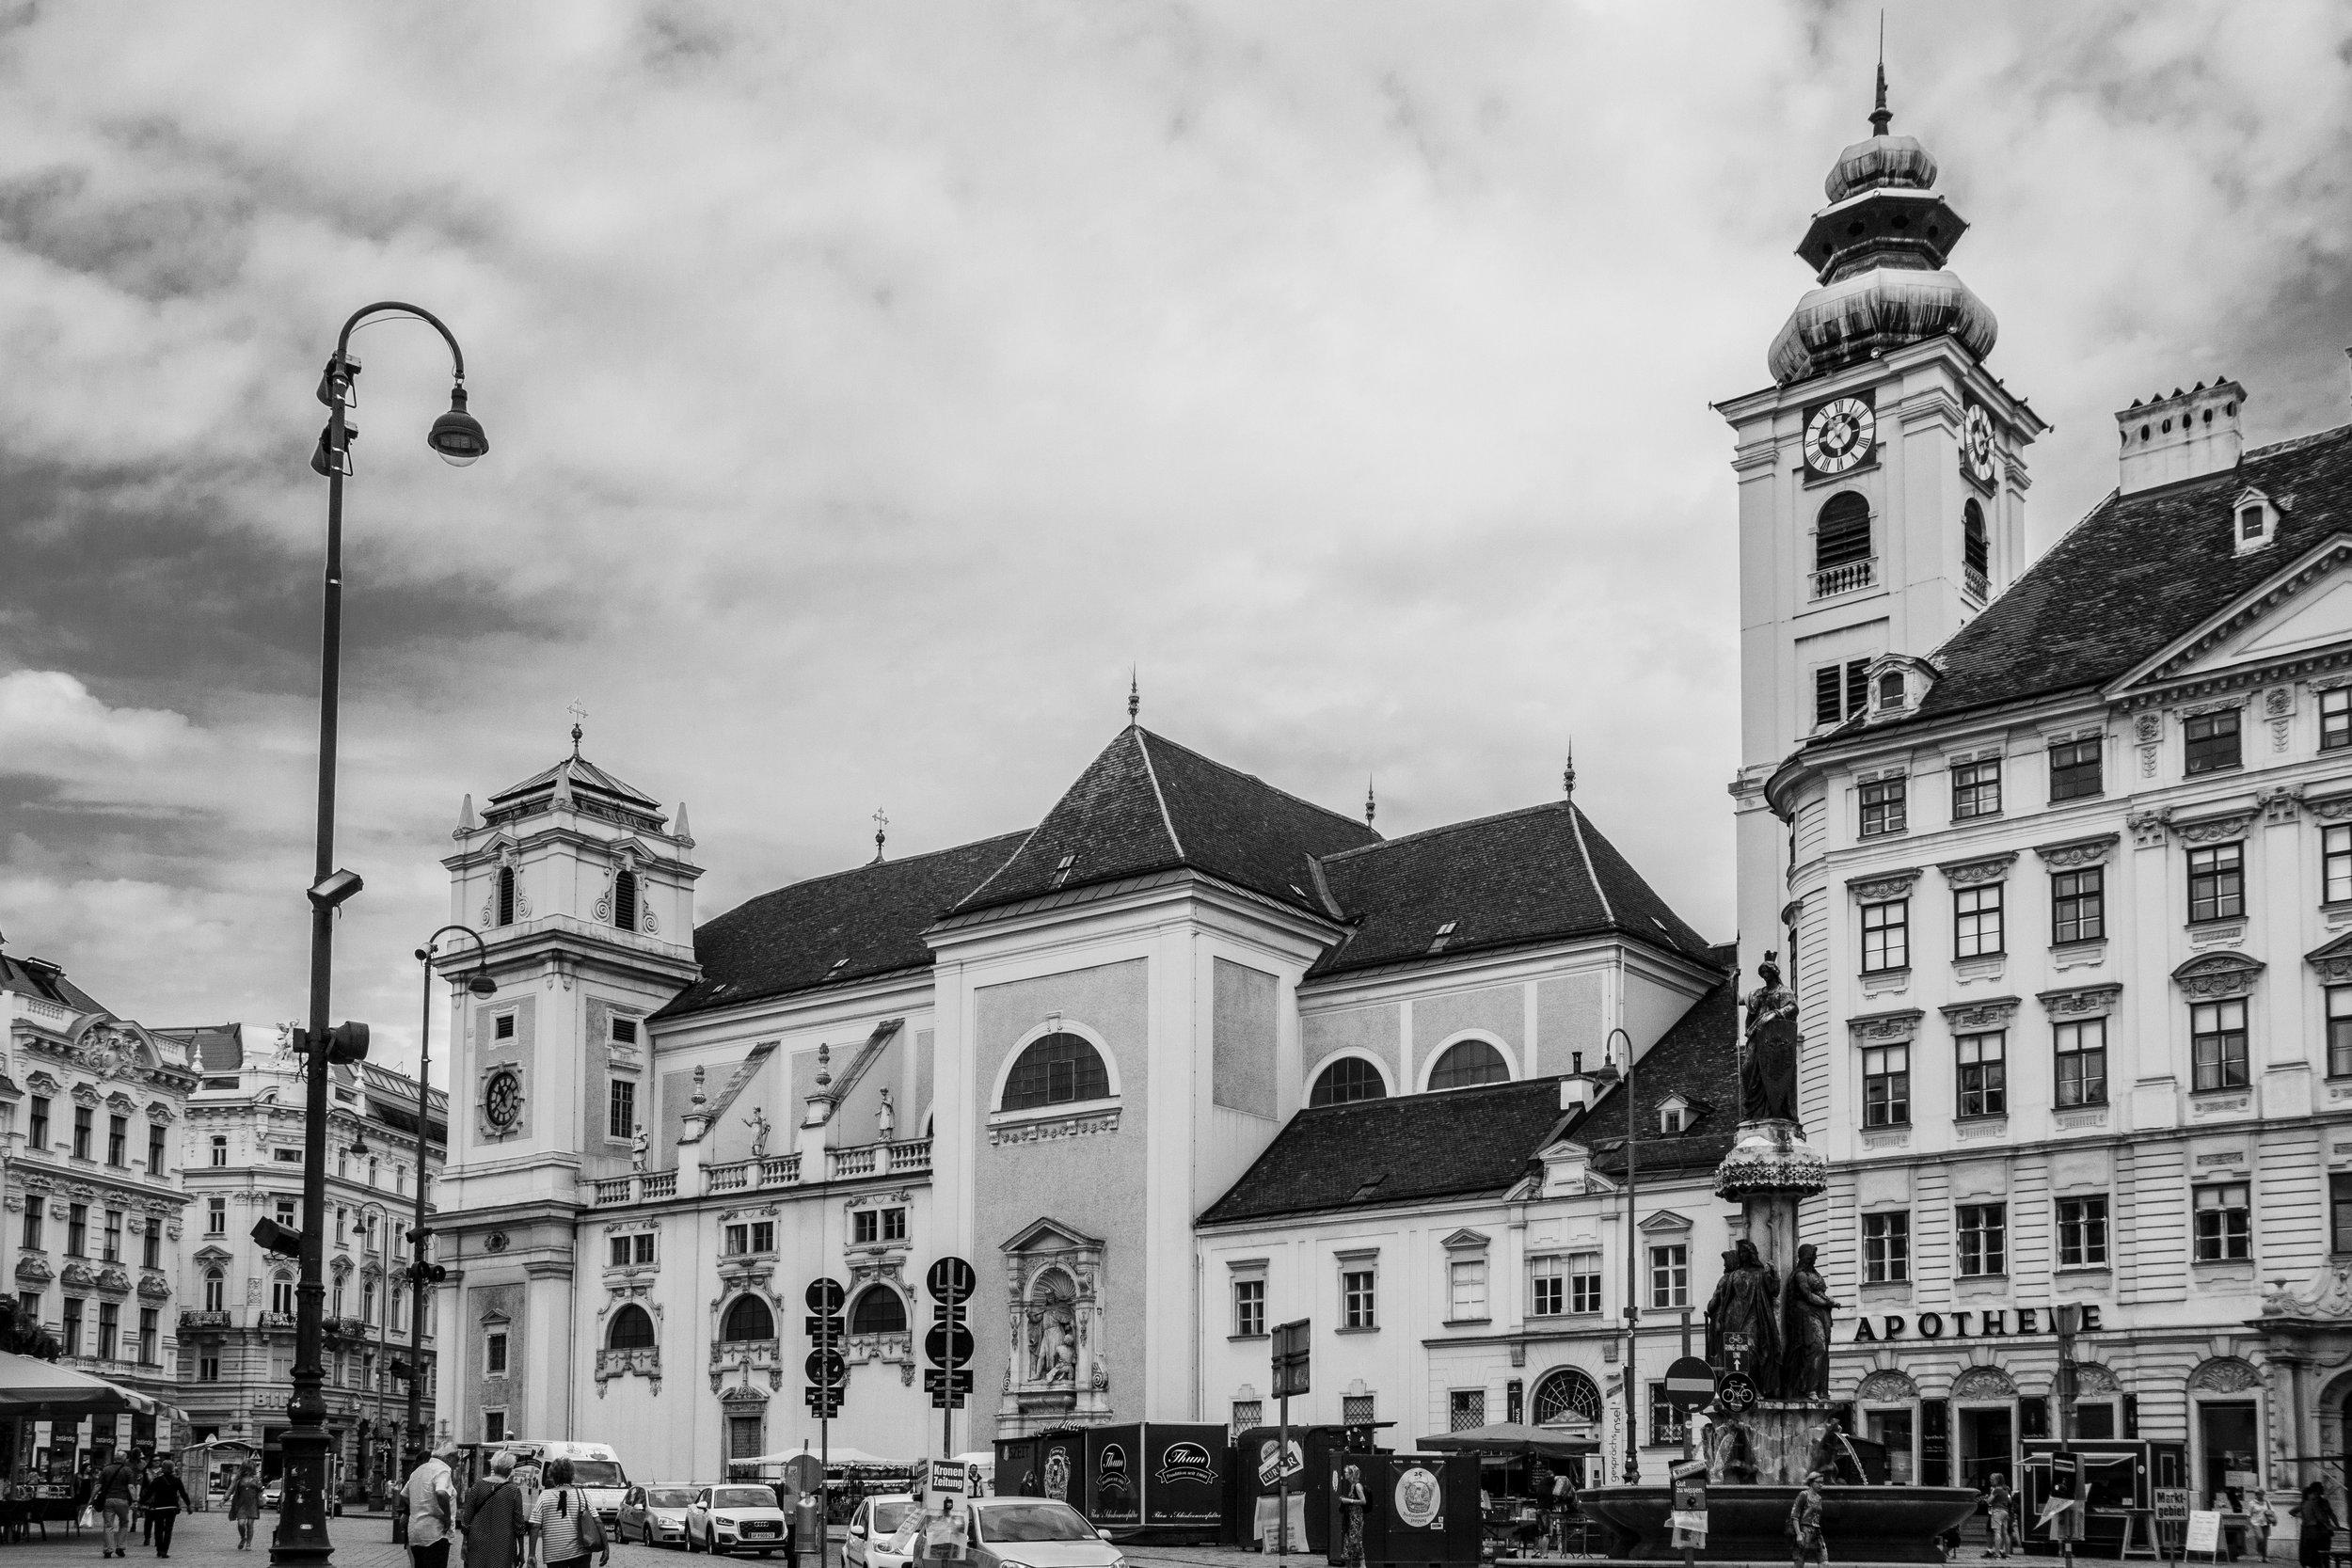 1010 Wien - Freyung - Schottenkirche